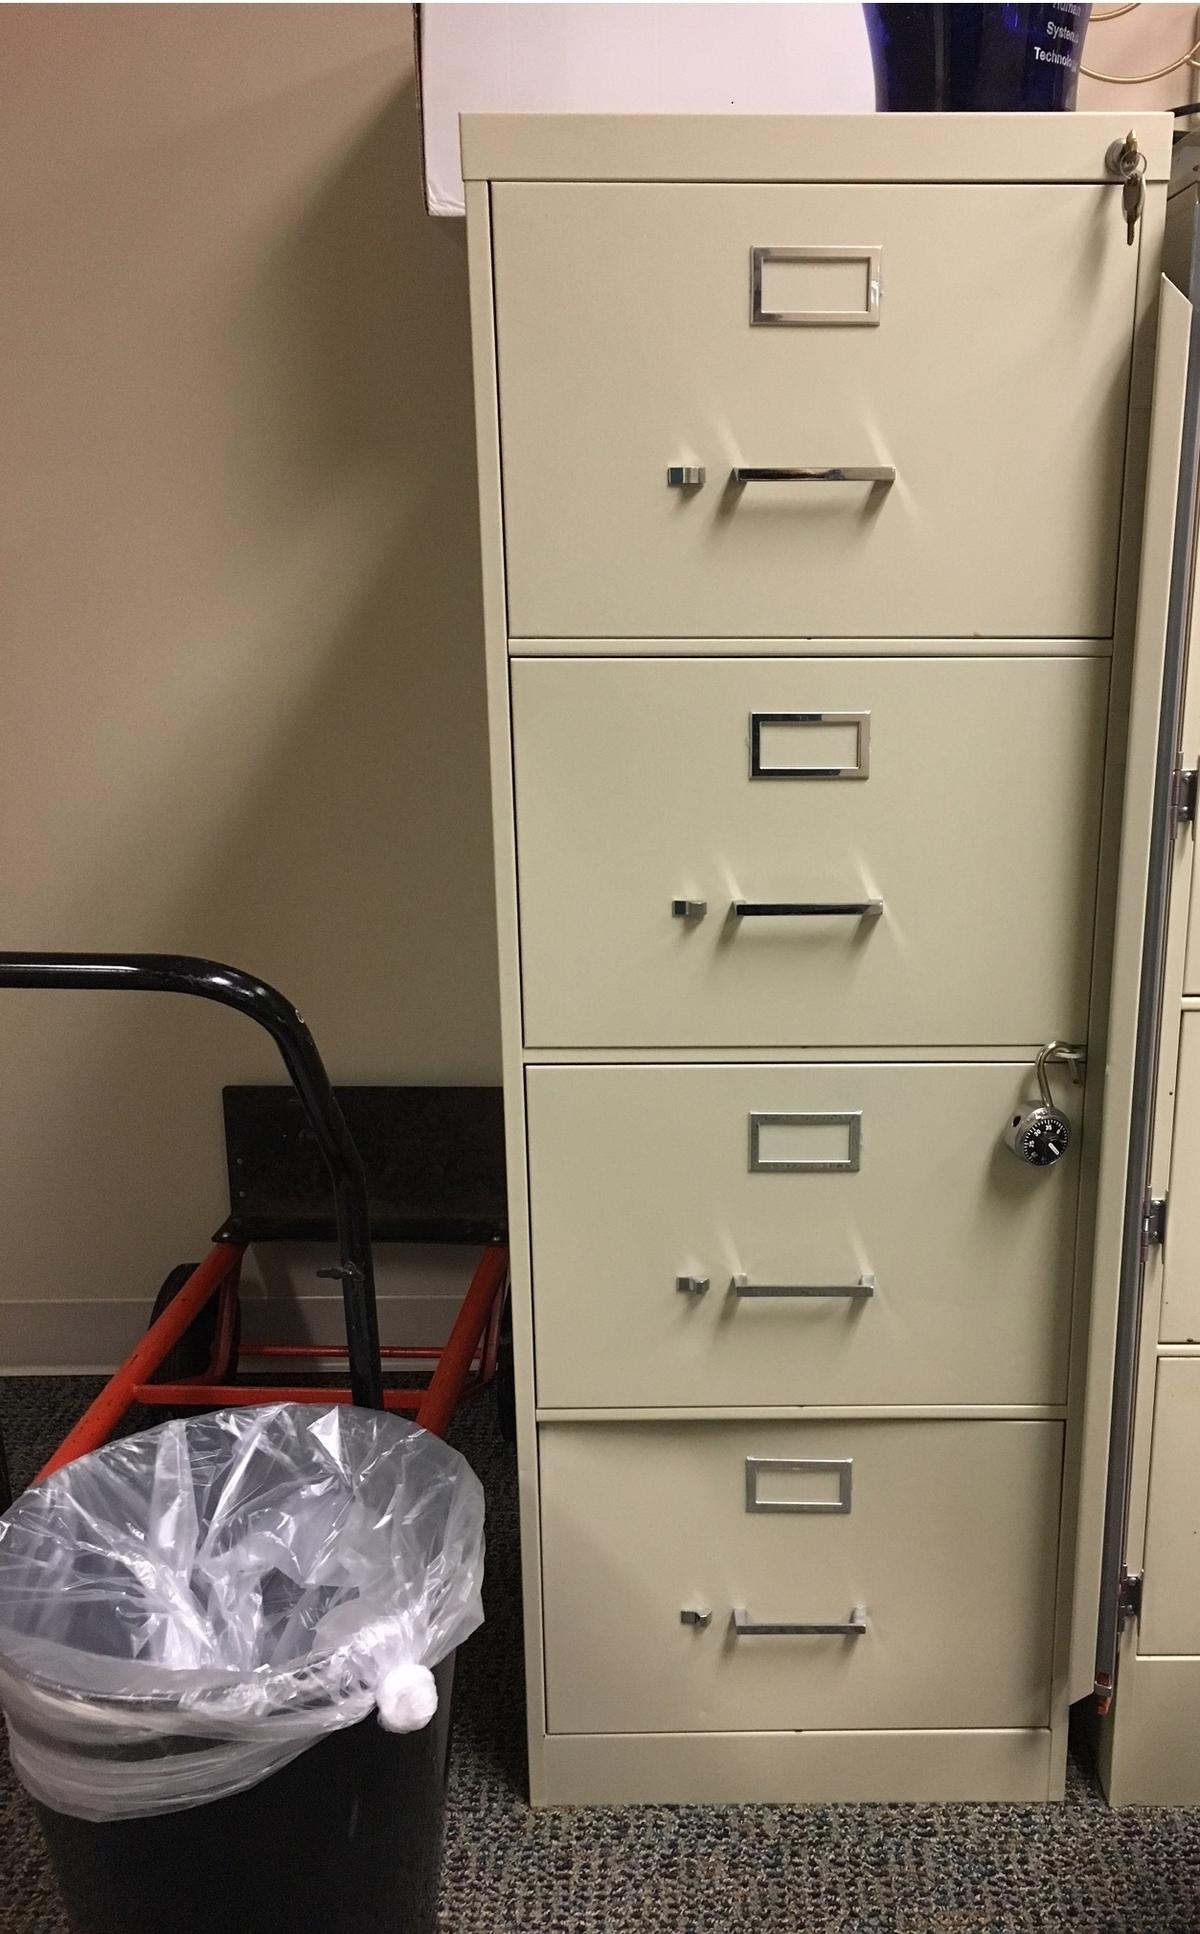 Locking (key Included) 2 Drawer LATERAL File Cabinet   Main Desk With  Supplies Drawers U003d 71u0027u0027 X 36u0027u0027   Ancillary Desk With Locking 2 Drawer  Lateral File ...